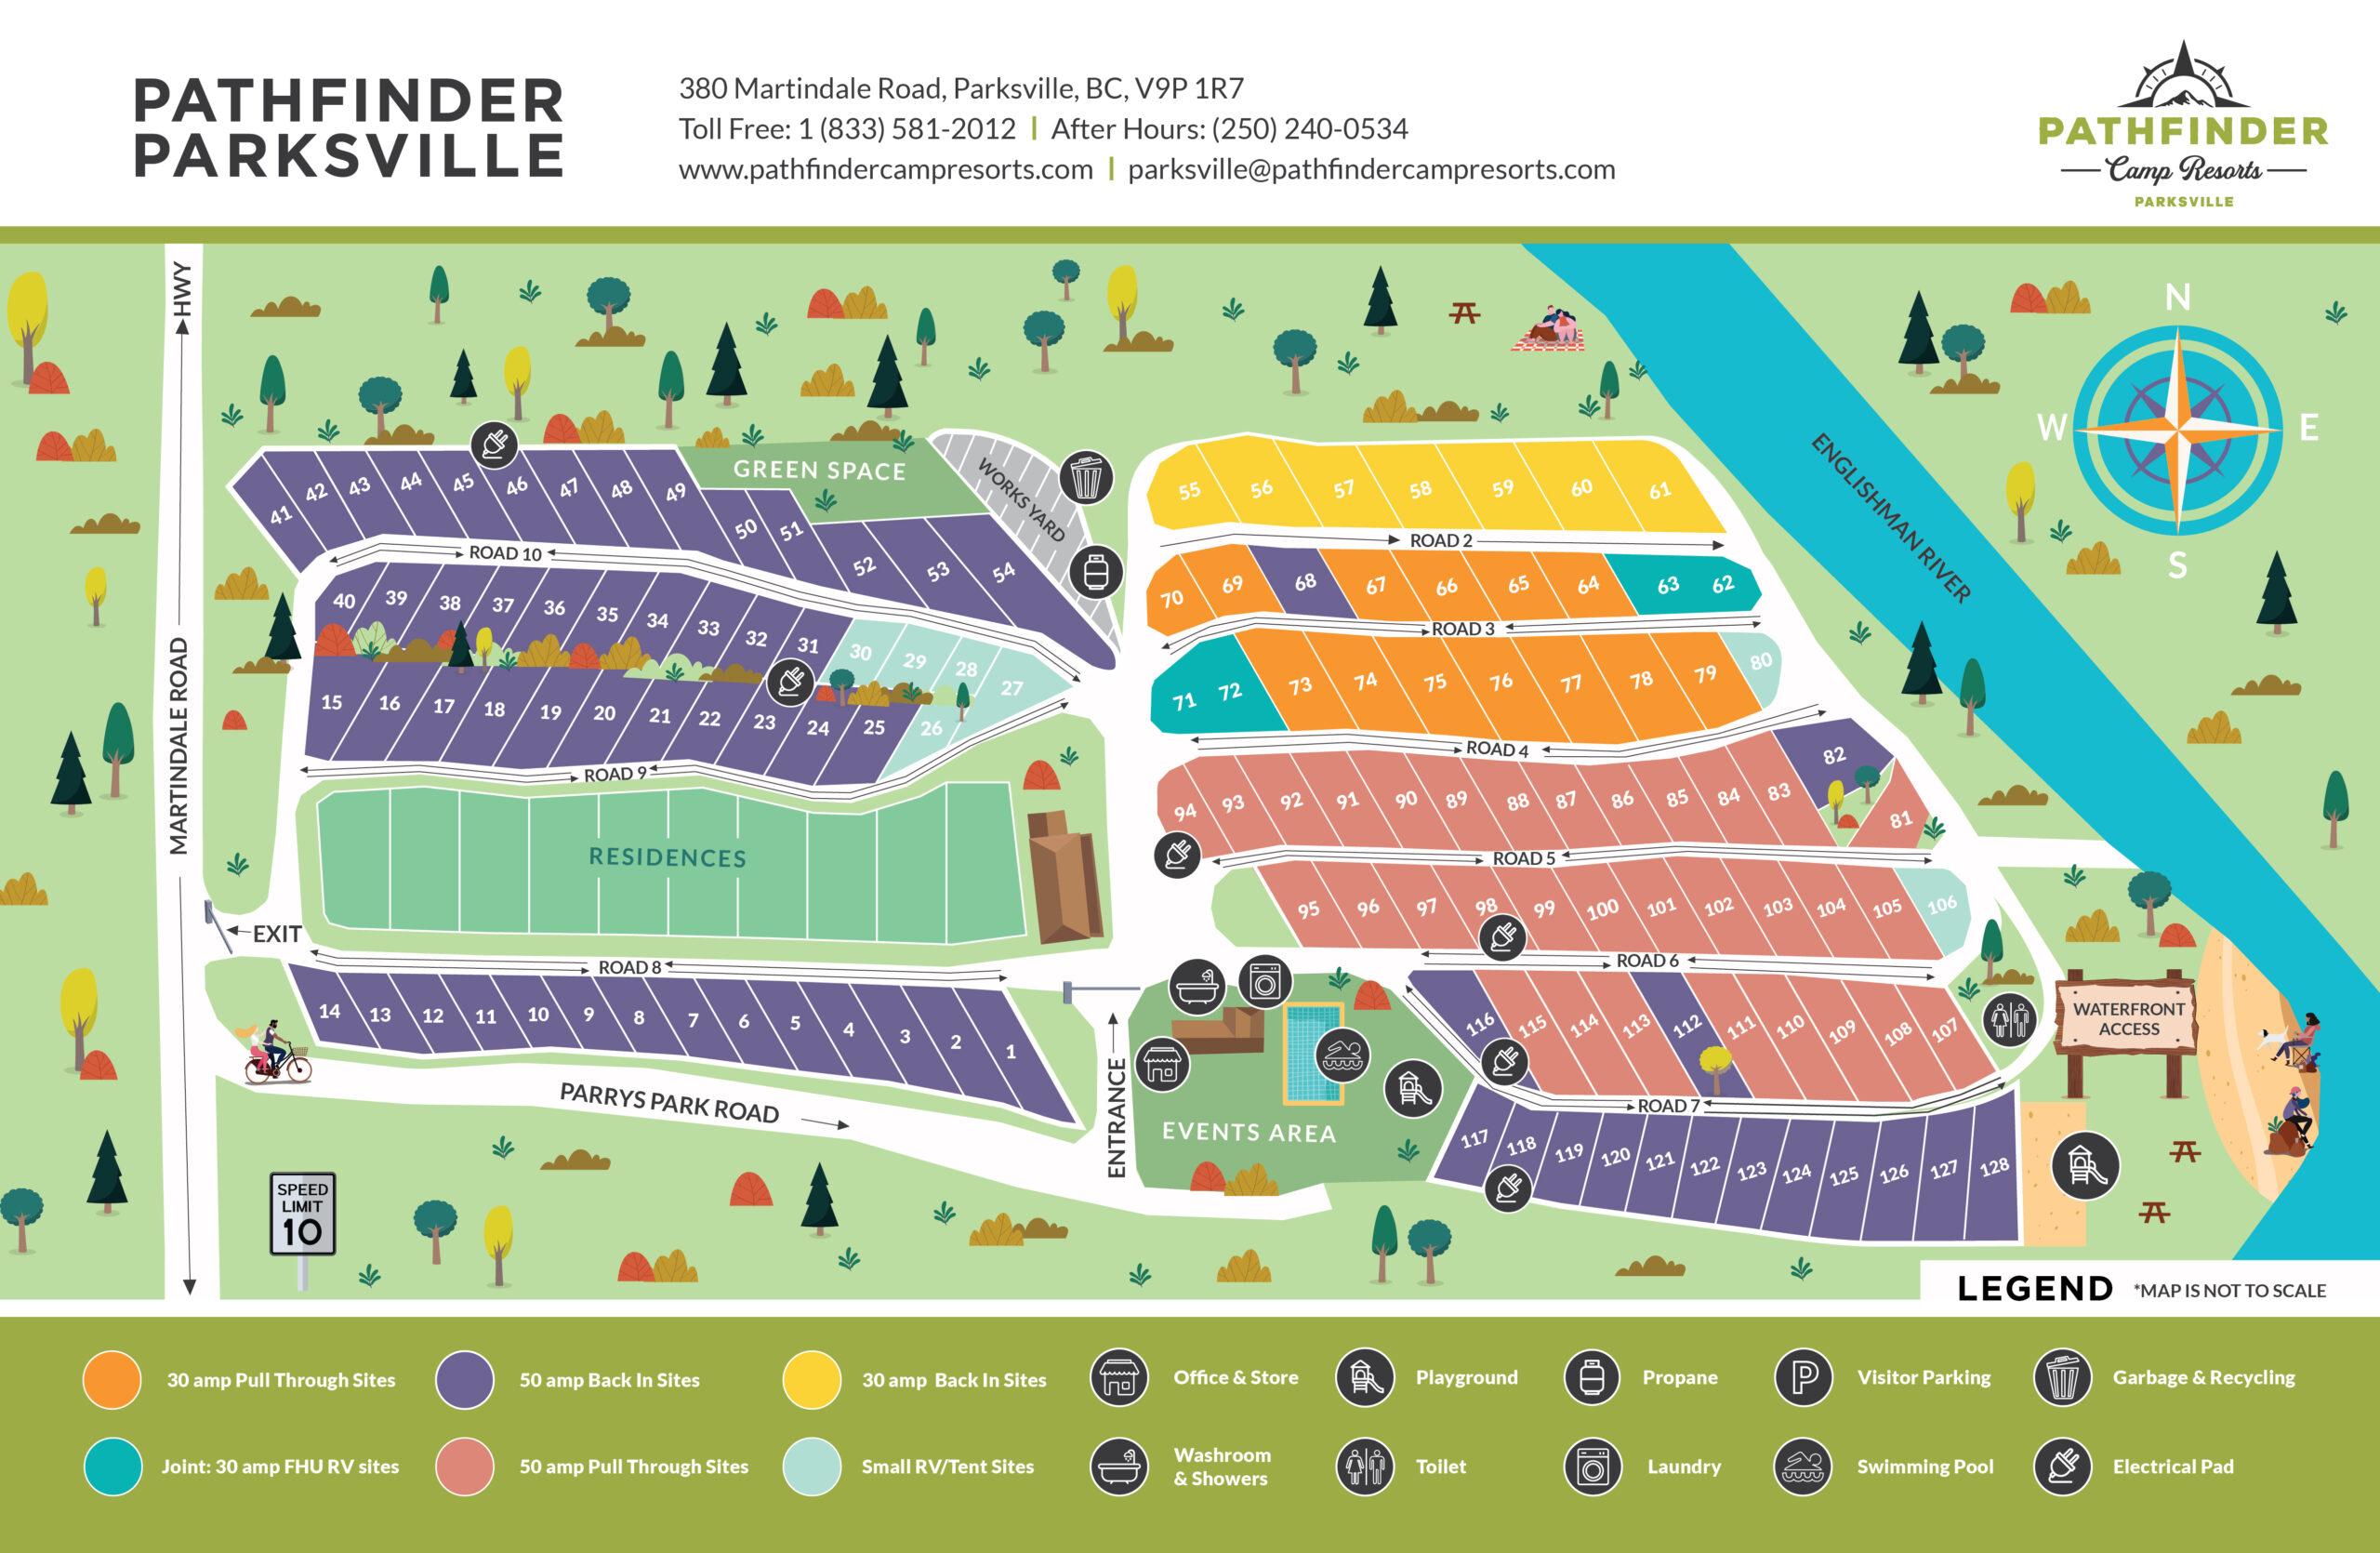 PATHFINDER CAMP RESORTS PARKSVILLE SITE MAP rv sites map englishman river qualicum rv park